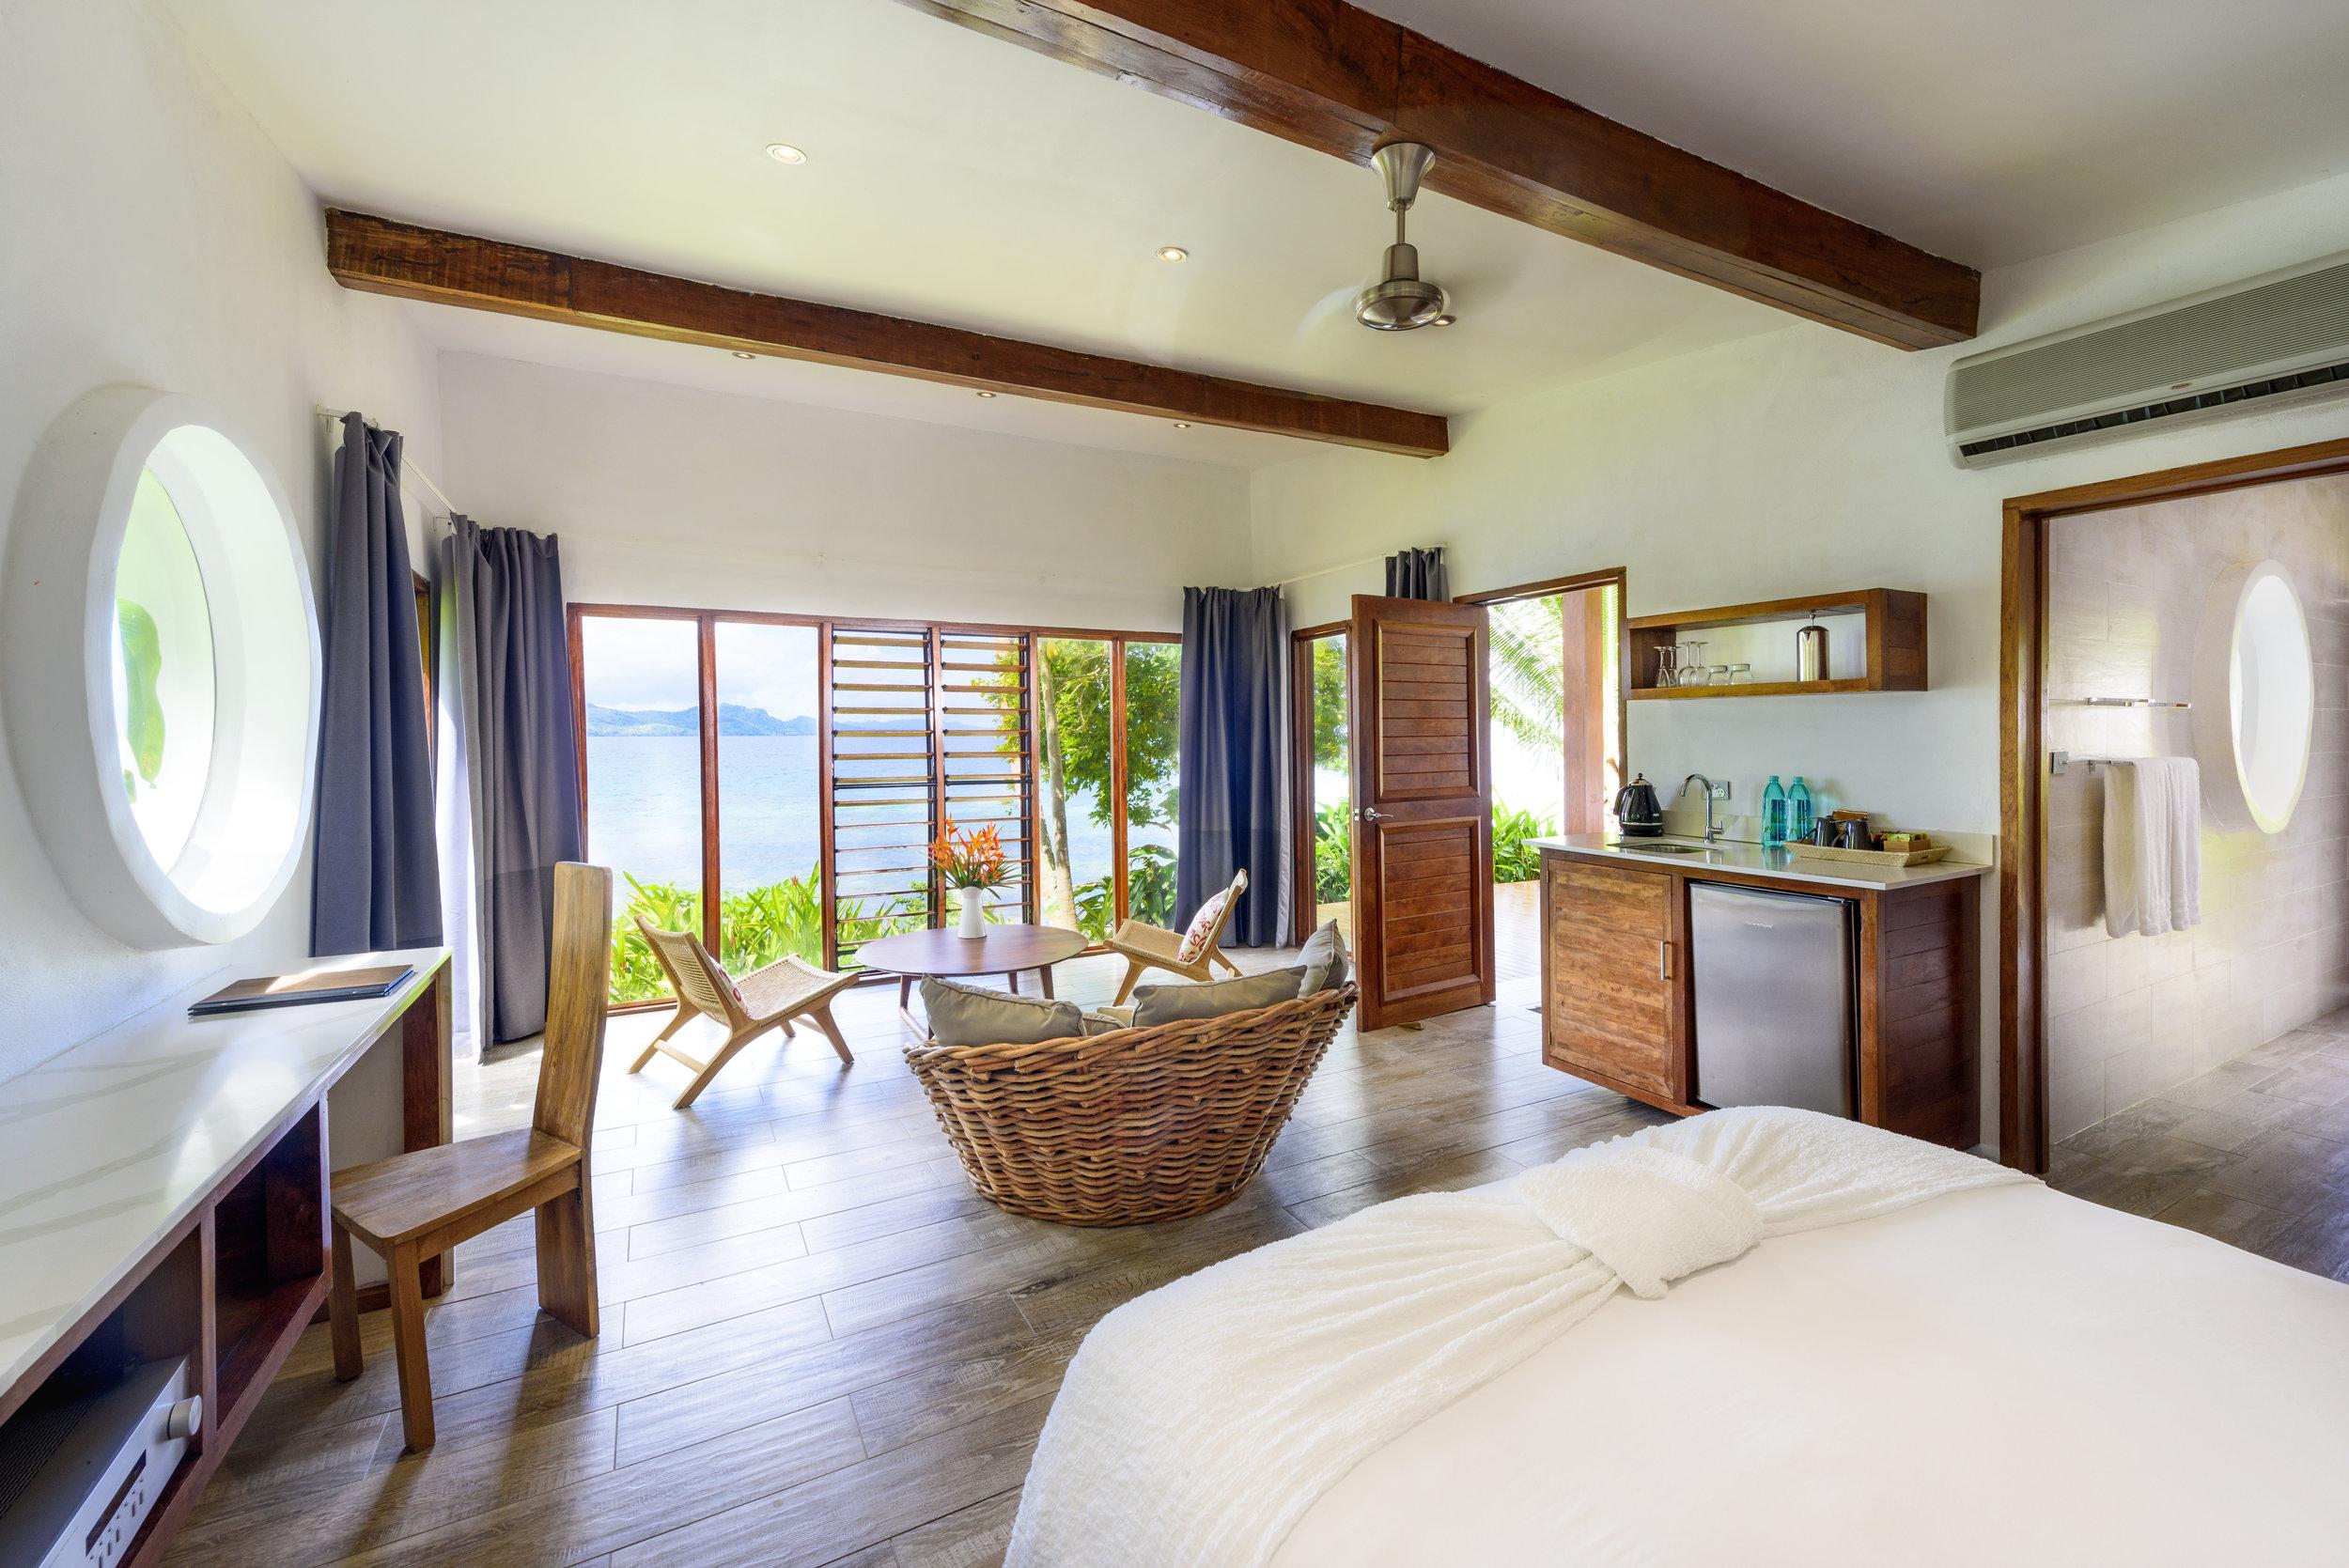 Fiji Resort - Couples Accommodation - Royal Retreat - Honeymoon - The Remote Resort2.jpg